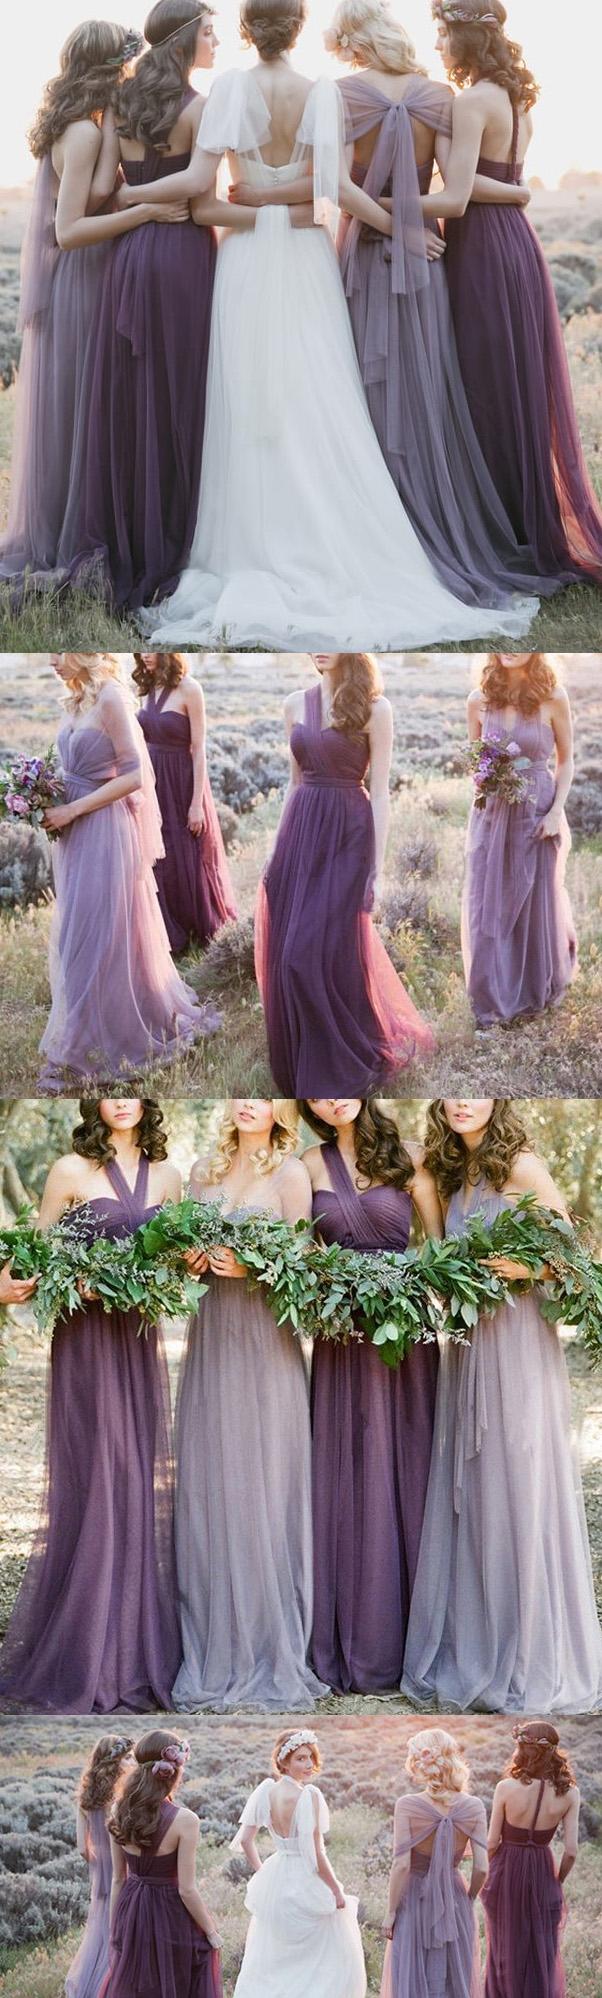 Customized sleeveless bridesmaid dress long purple bridesmaid